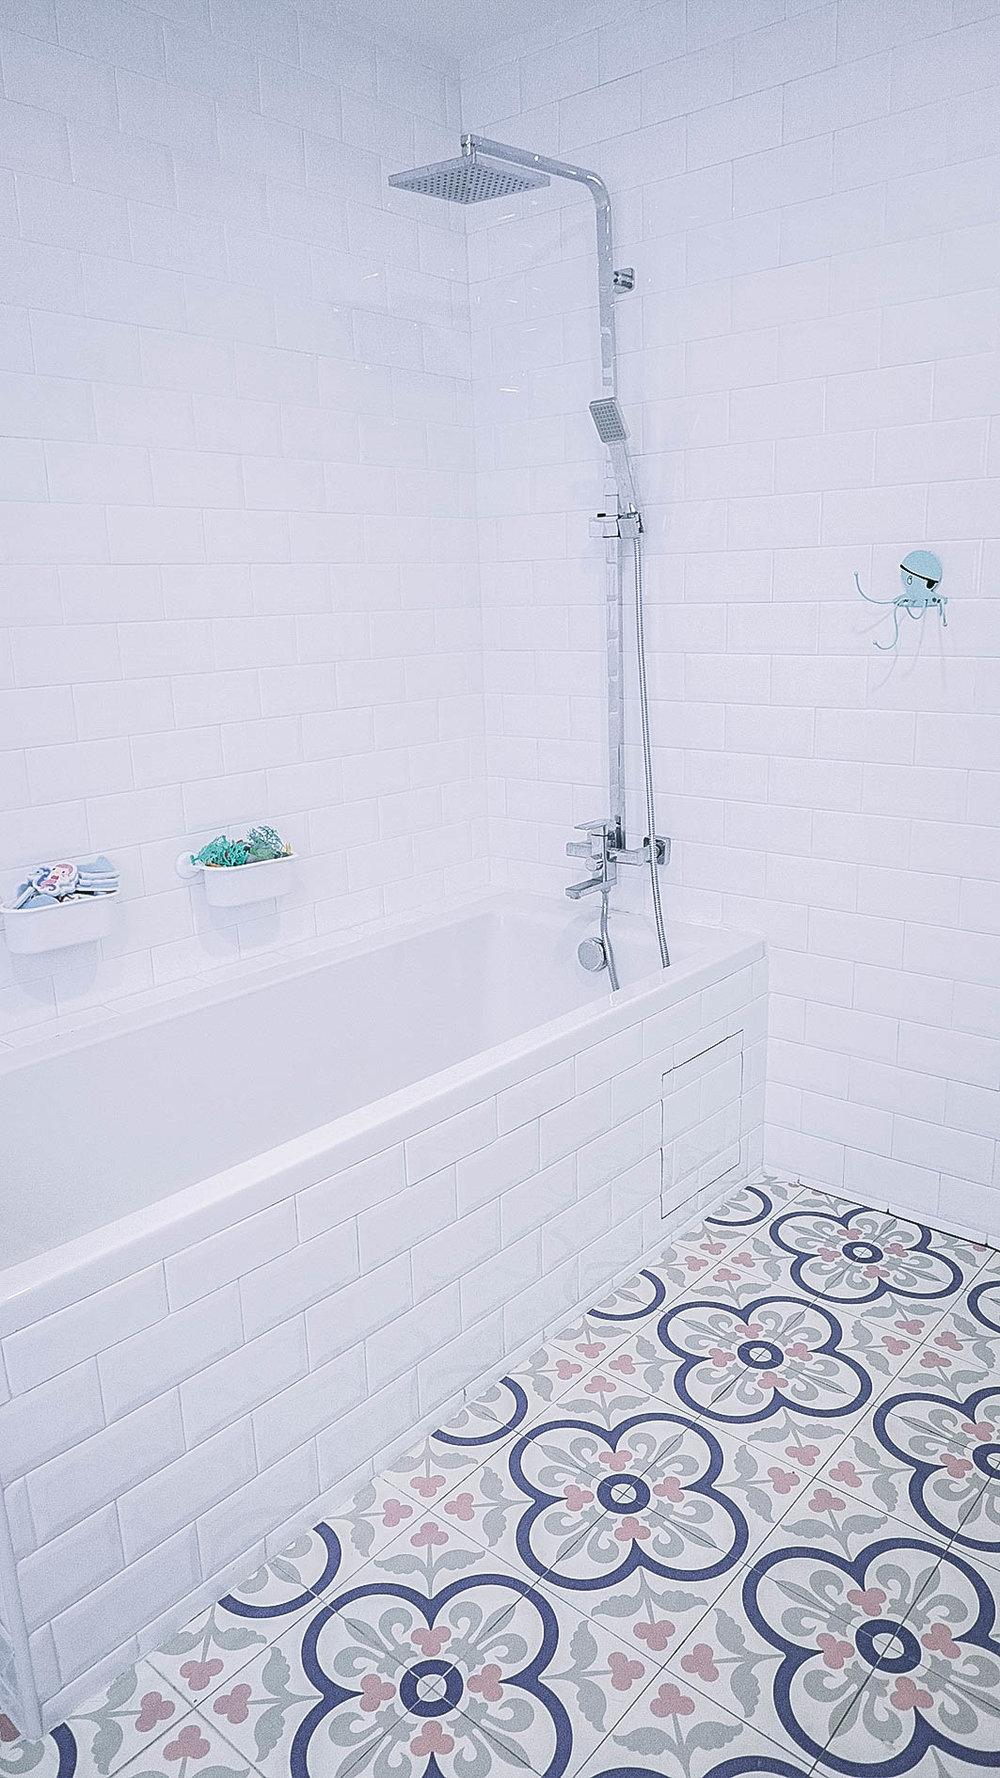 Cool Rain Shower Bathtub Graphic Tiles